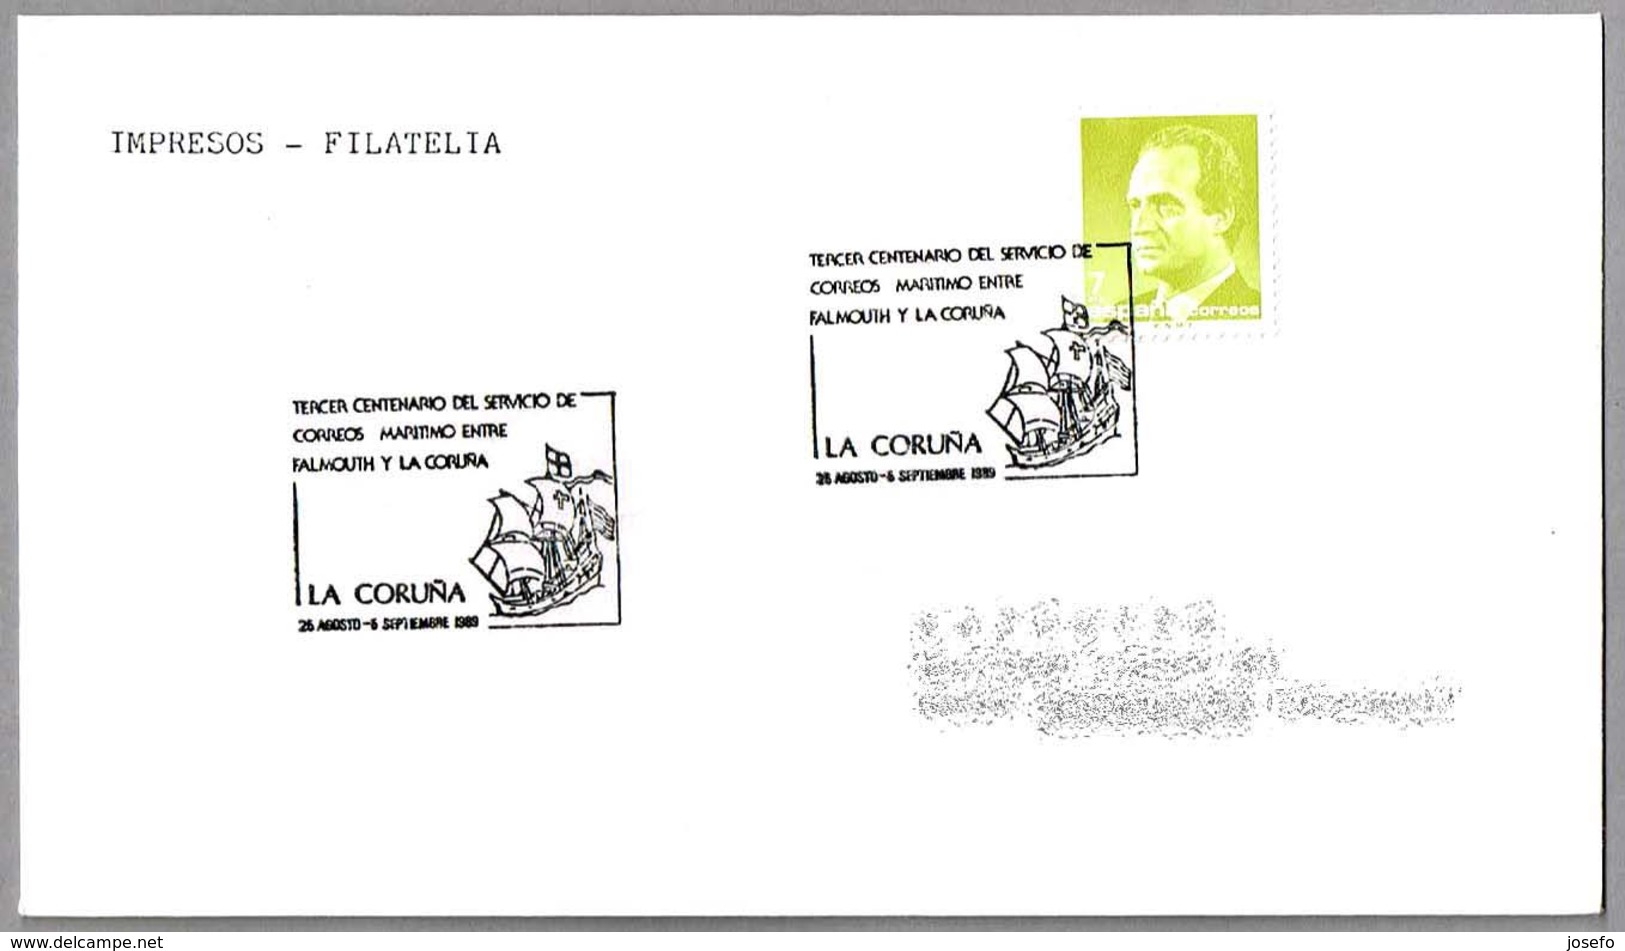 III CENT. CORREO MARITIMO FALMOUTH-LA CORUÑA - Maritime Mail. La Coruña, Galicia, 1989 - Correo Postal